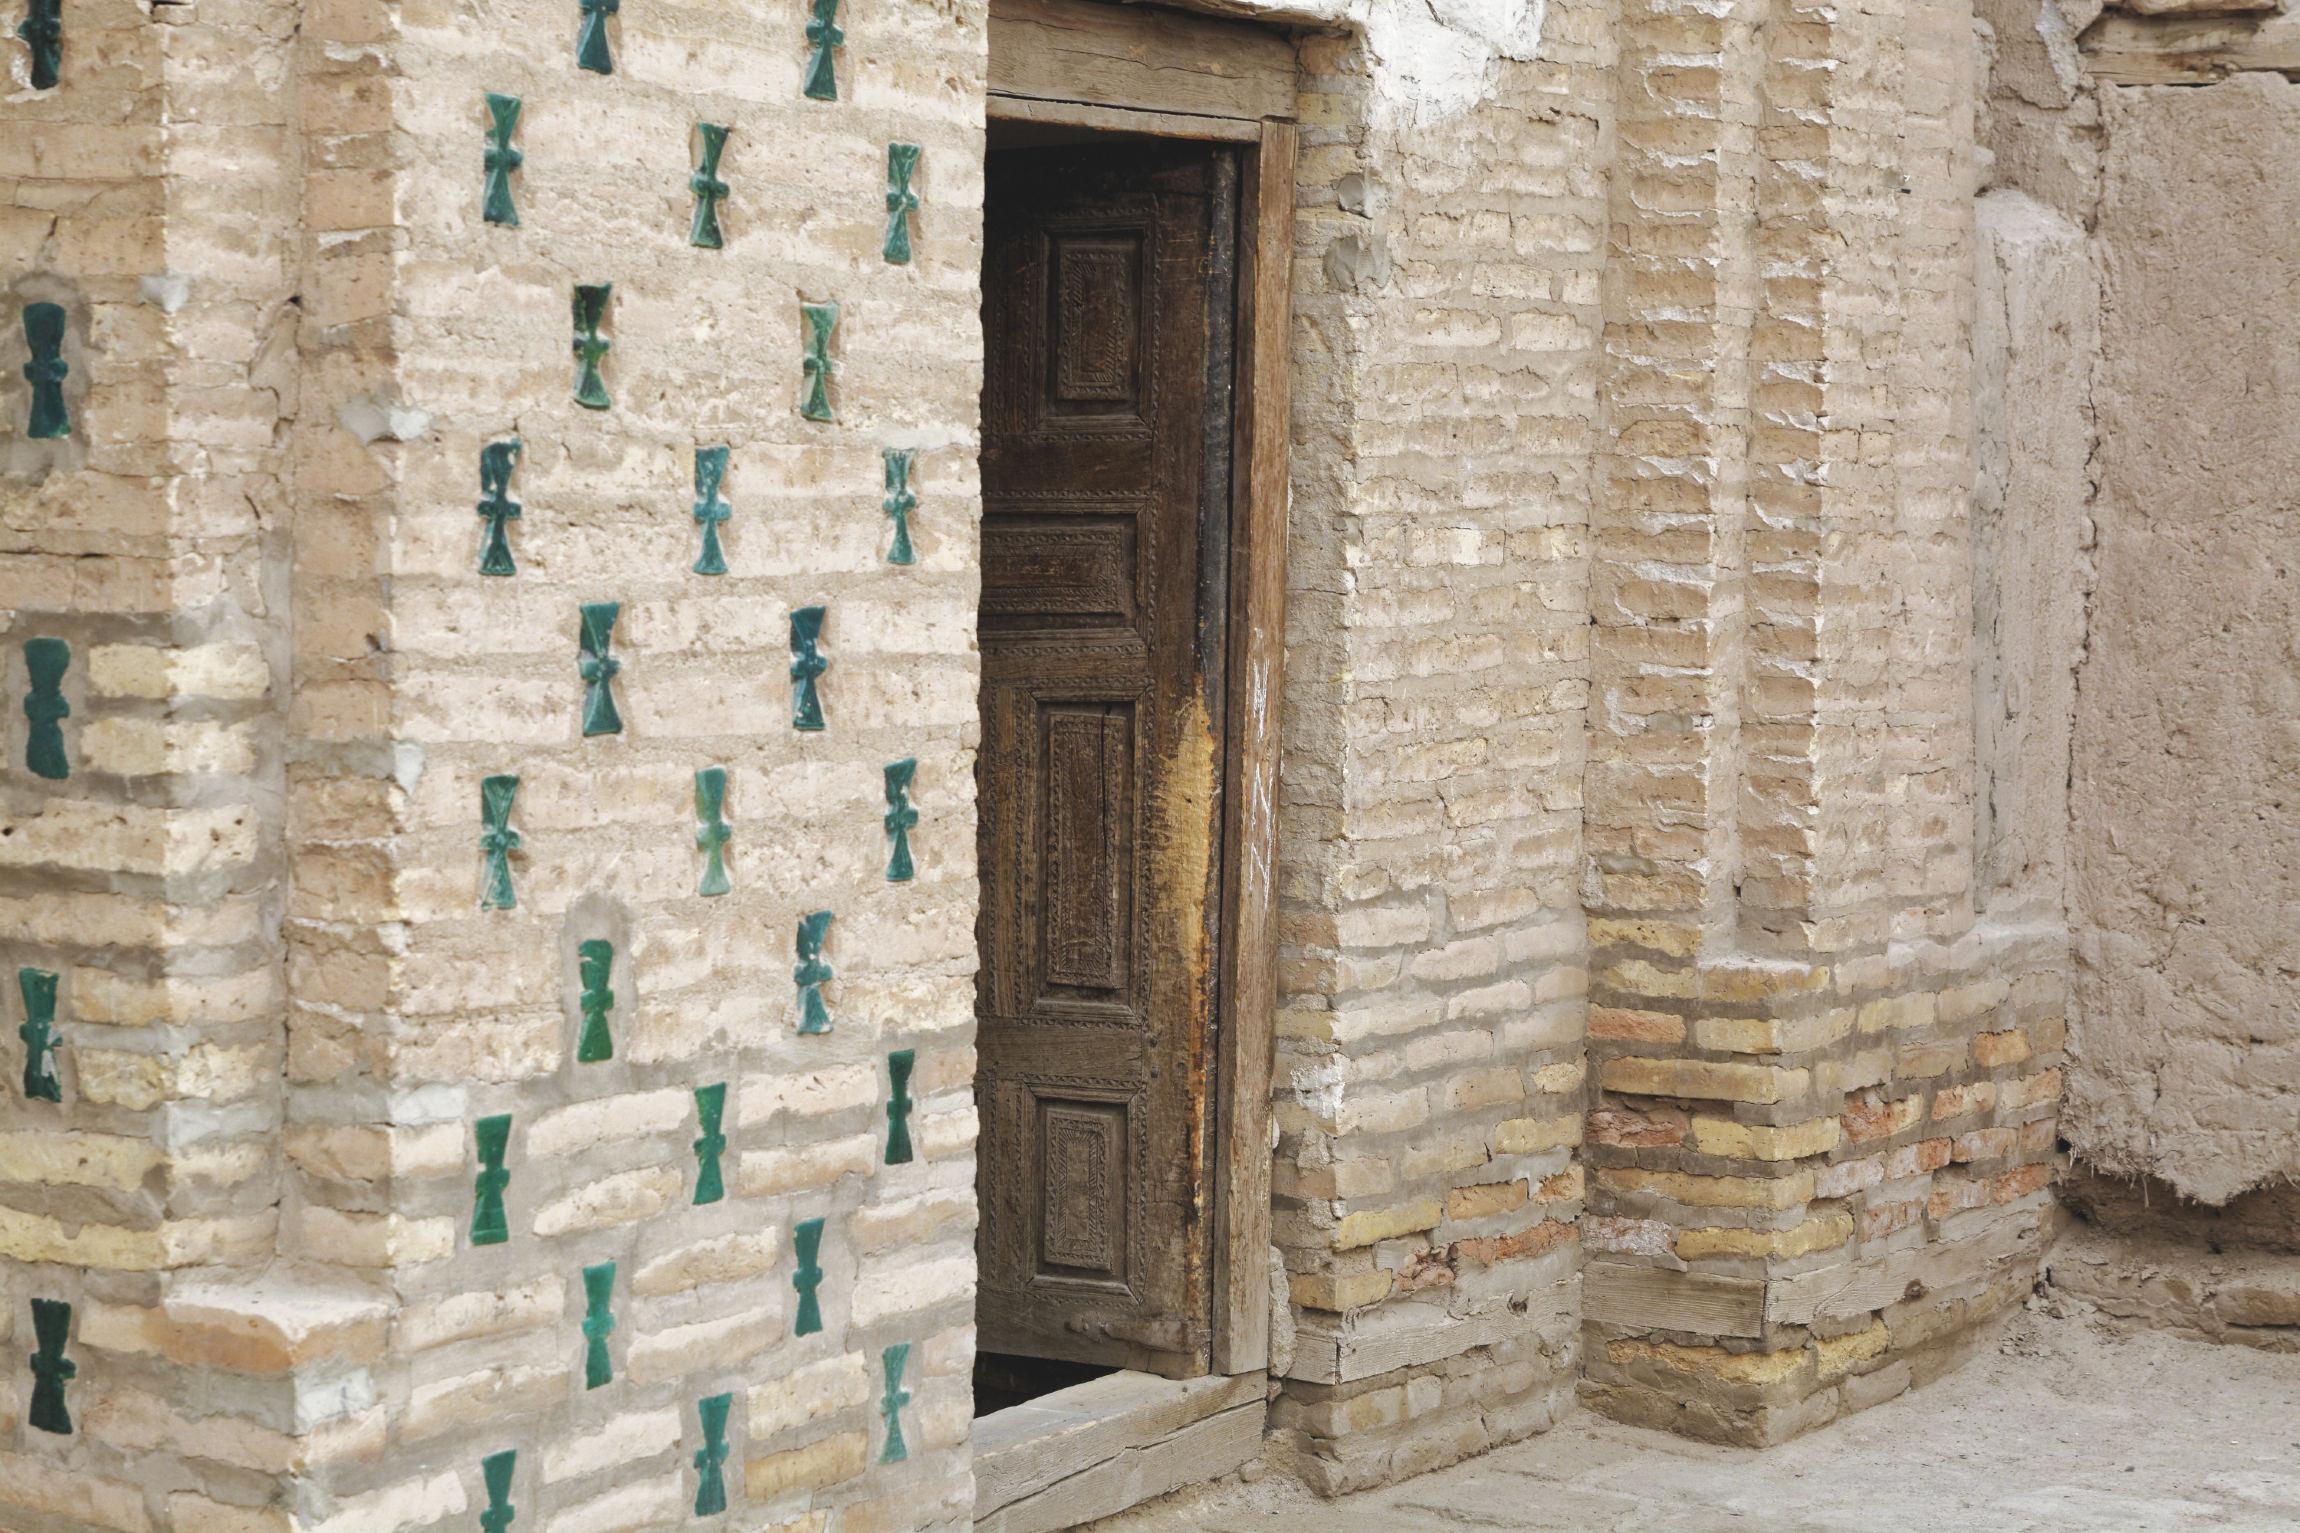 Porte et céramique Khiva